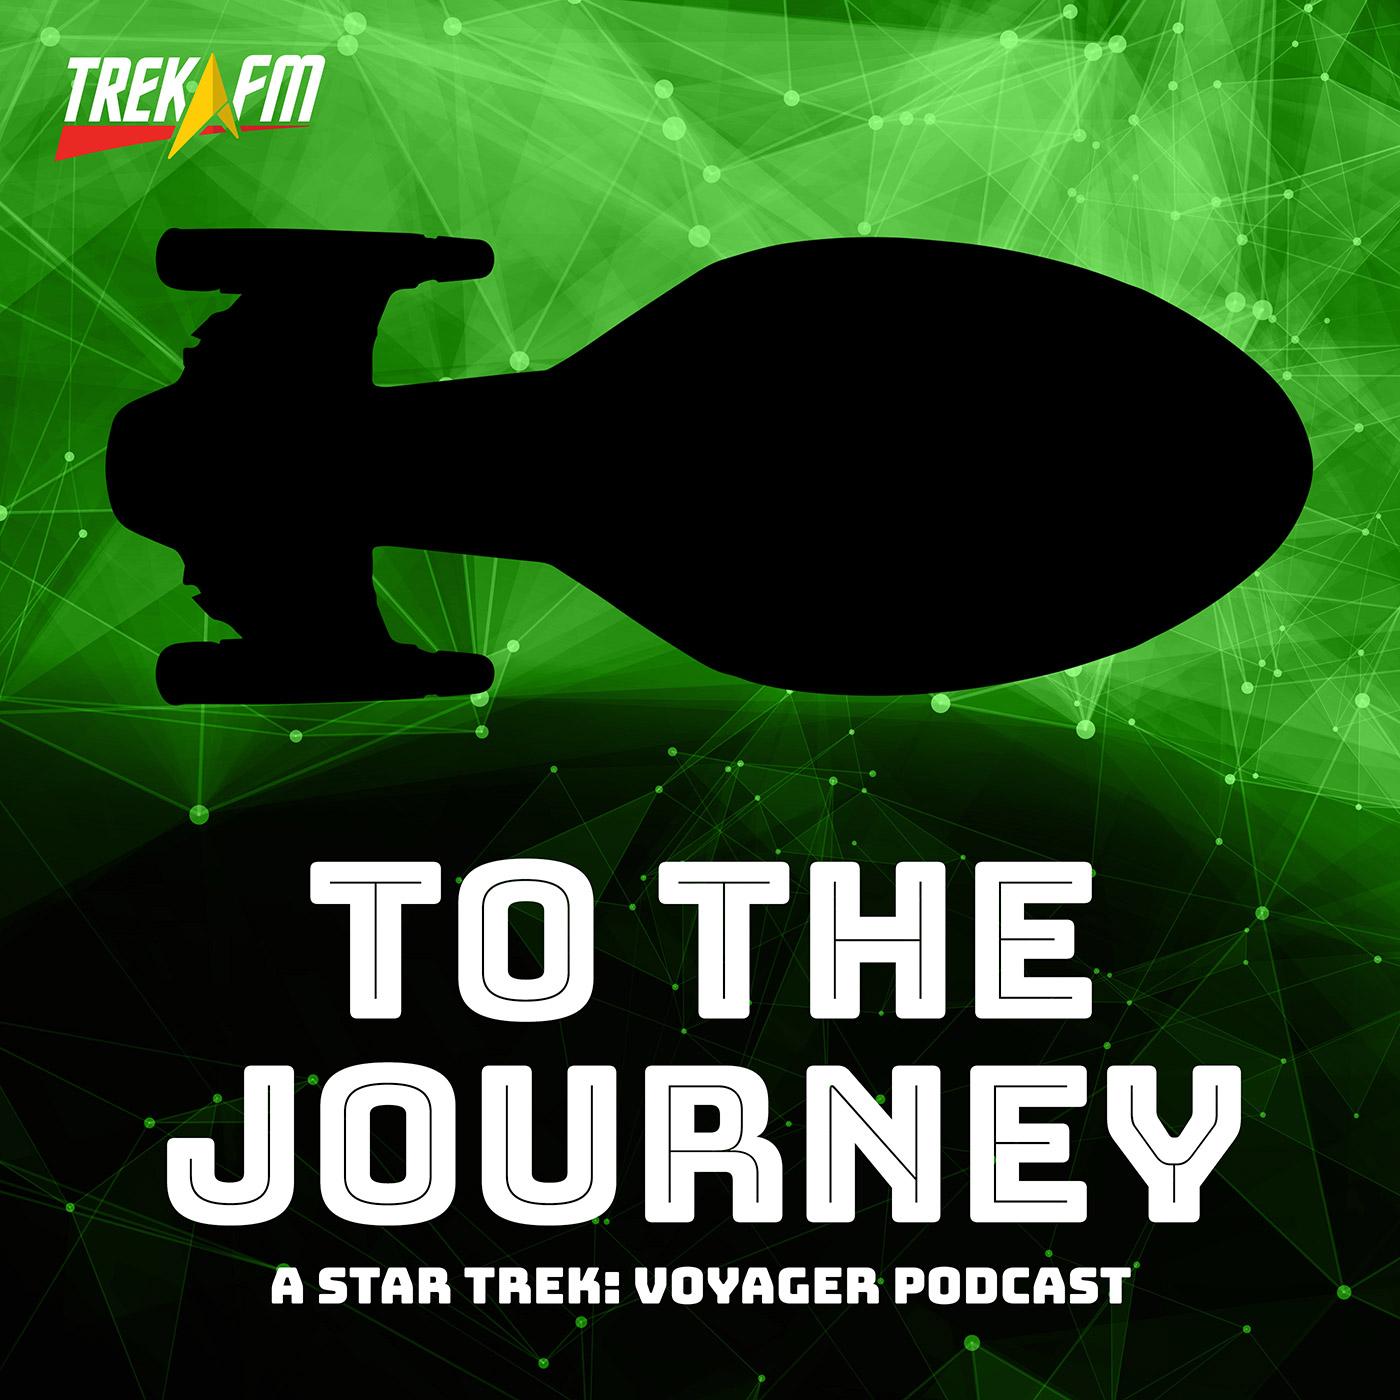 Watch star trek voyager tuvix online dating